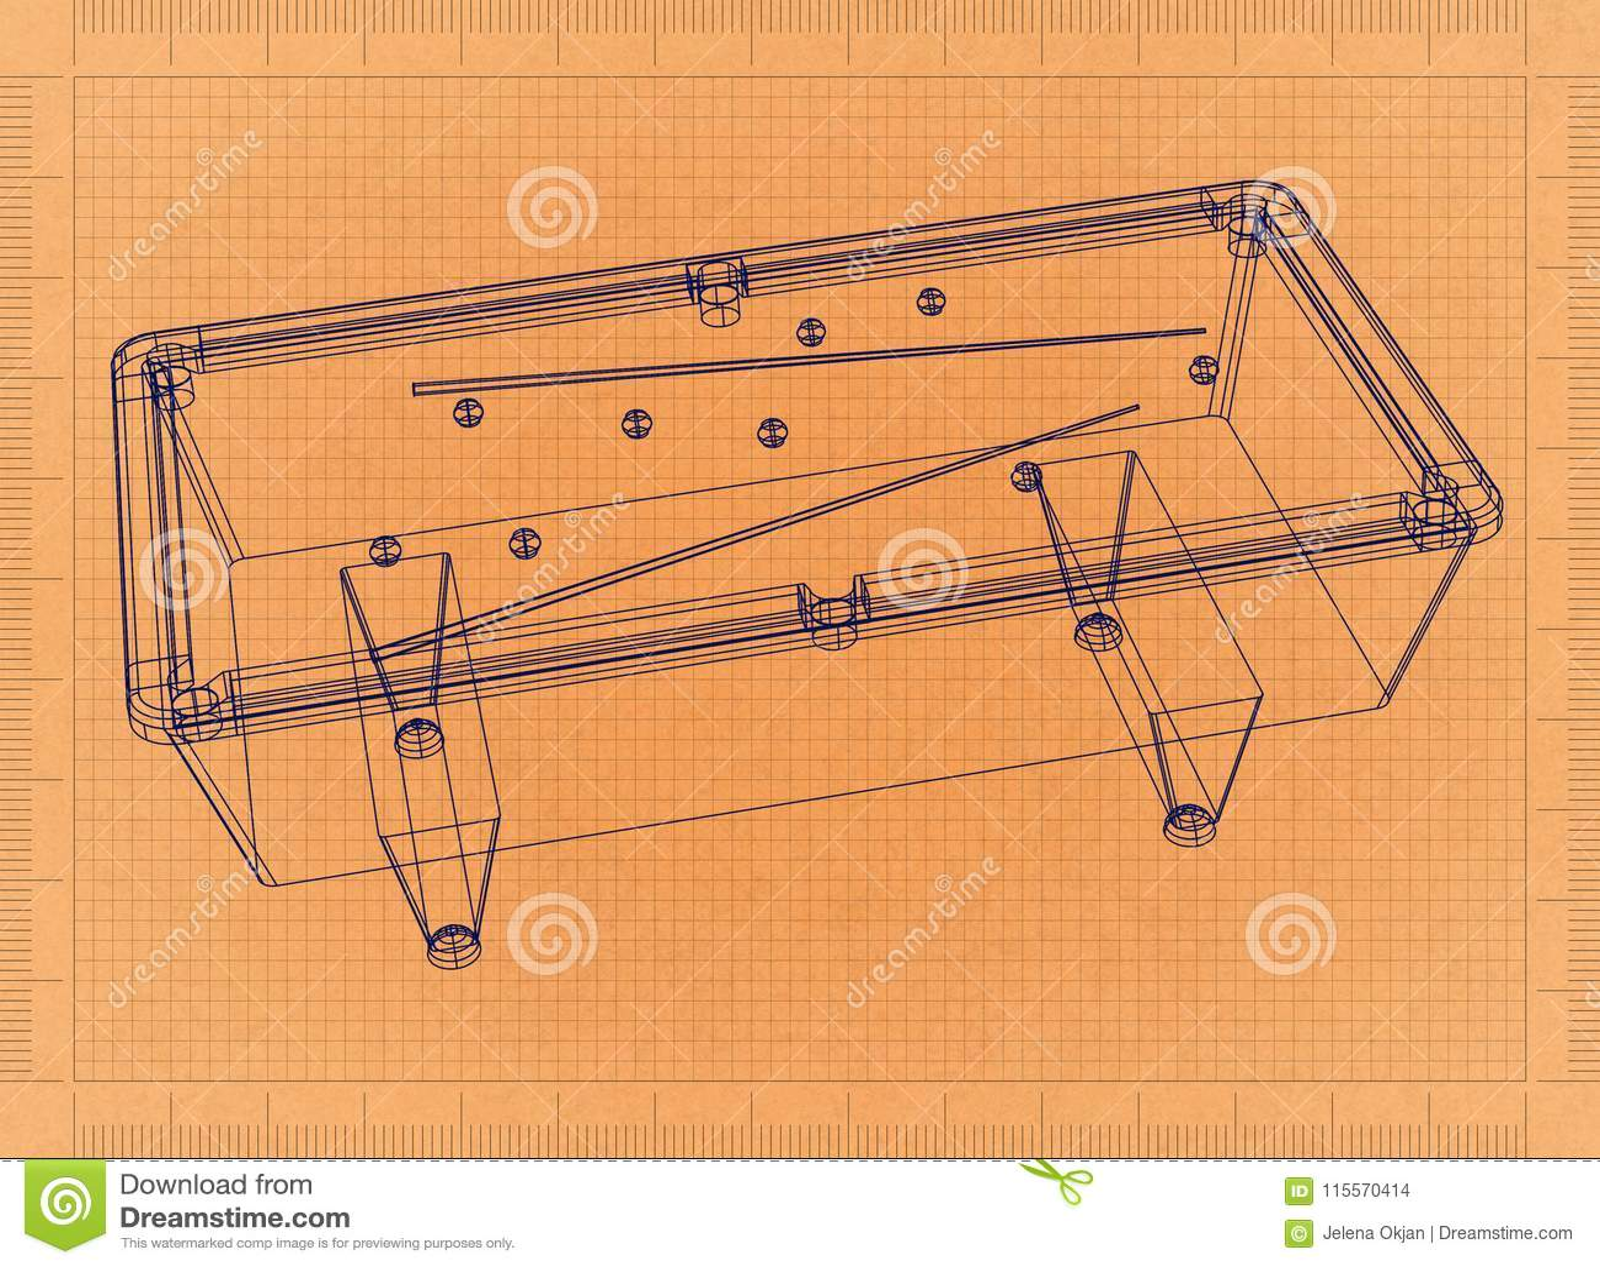 Billiard Table - Retro Blueprint Stock Illustration ... on tv schematics, pool tool ball ghost, pool hole sizes, whirlpool schematics, computer schematics, elevator schematics, pinball schematics, pool drawing, stereo schematics, air hockey schematics,